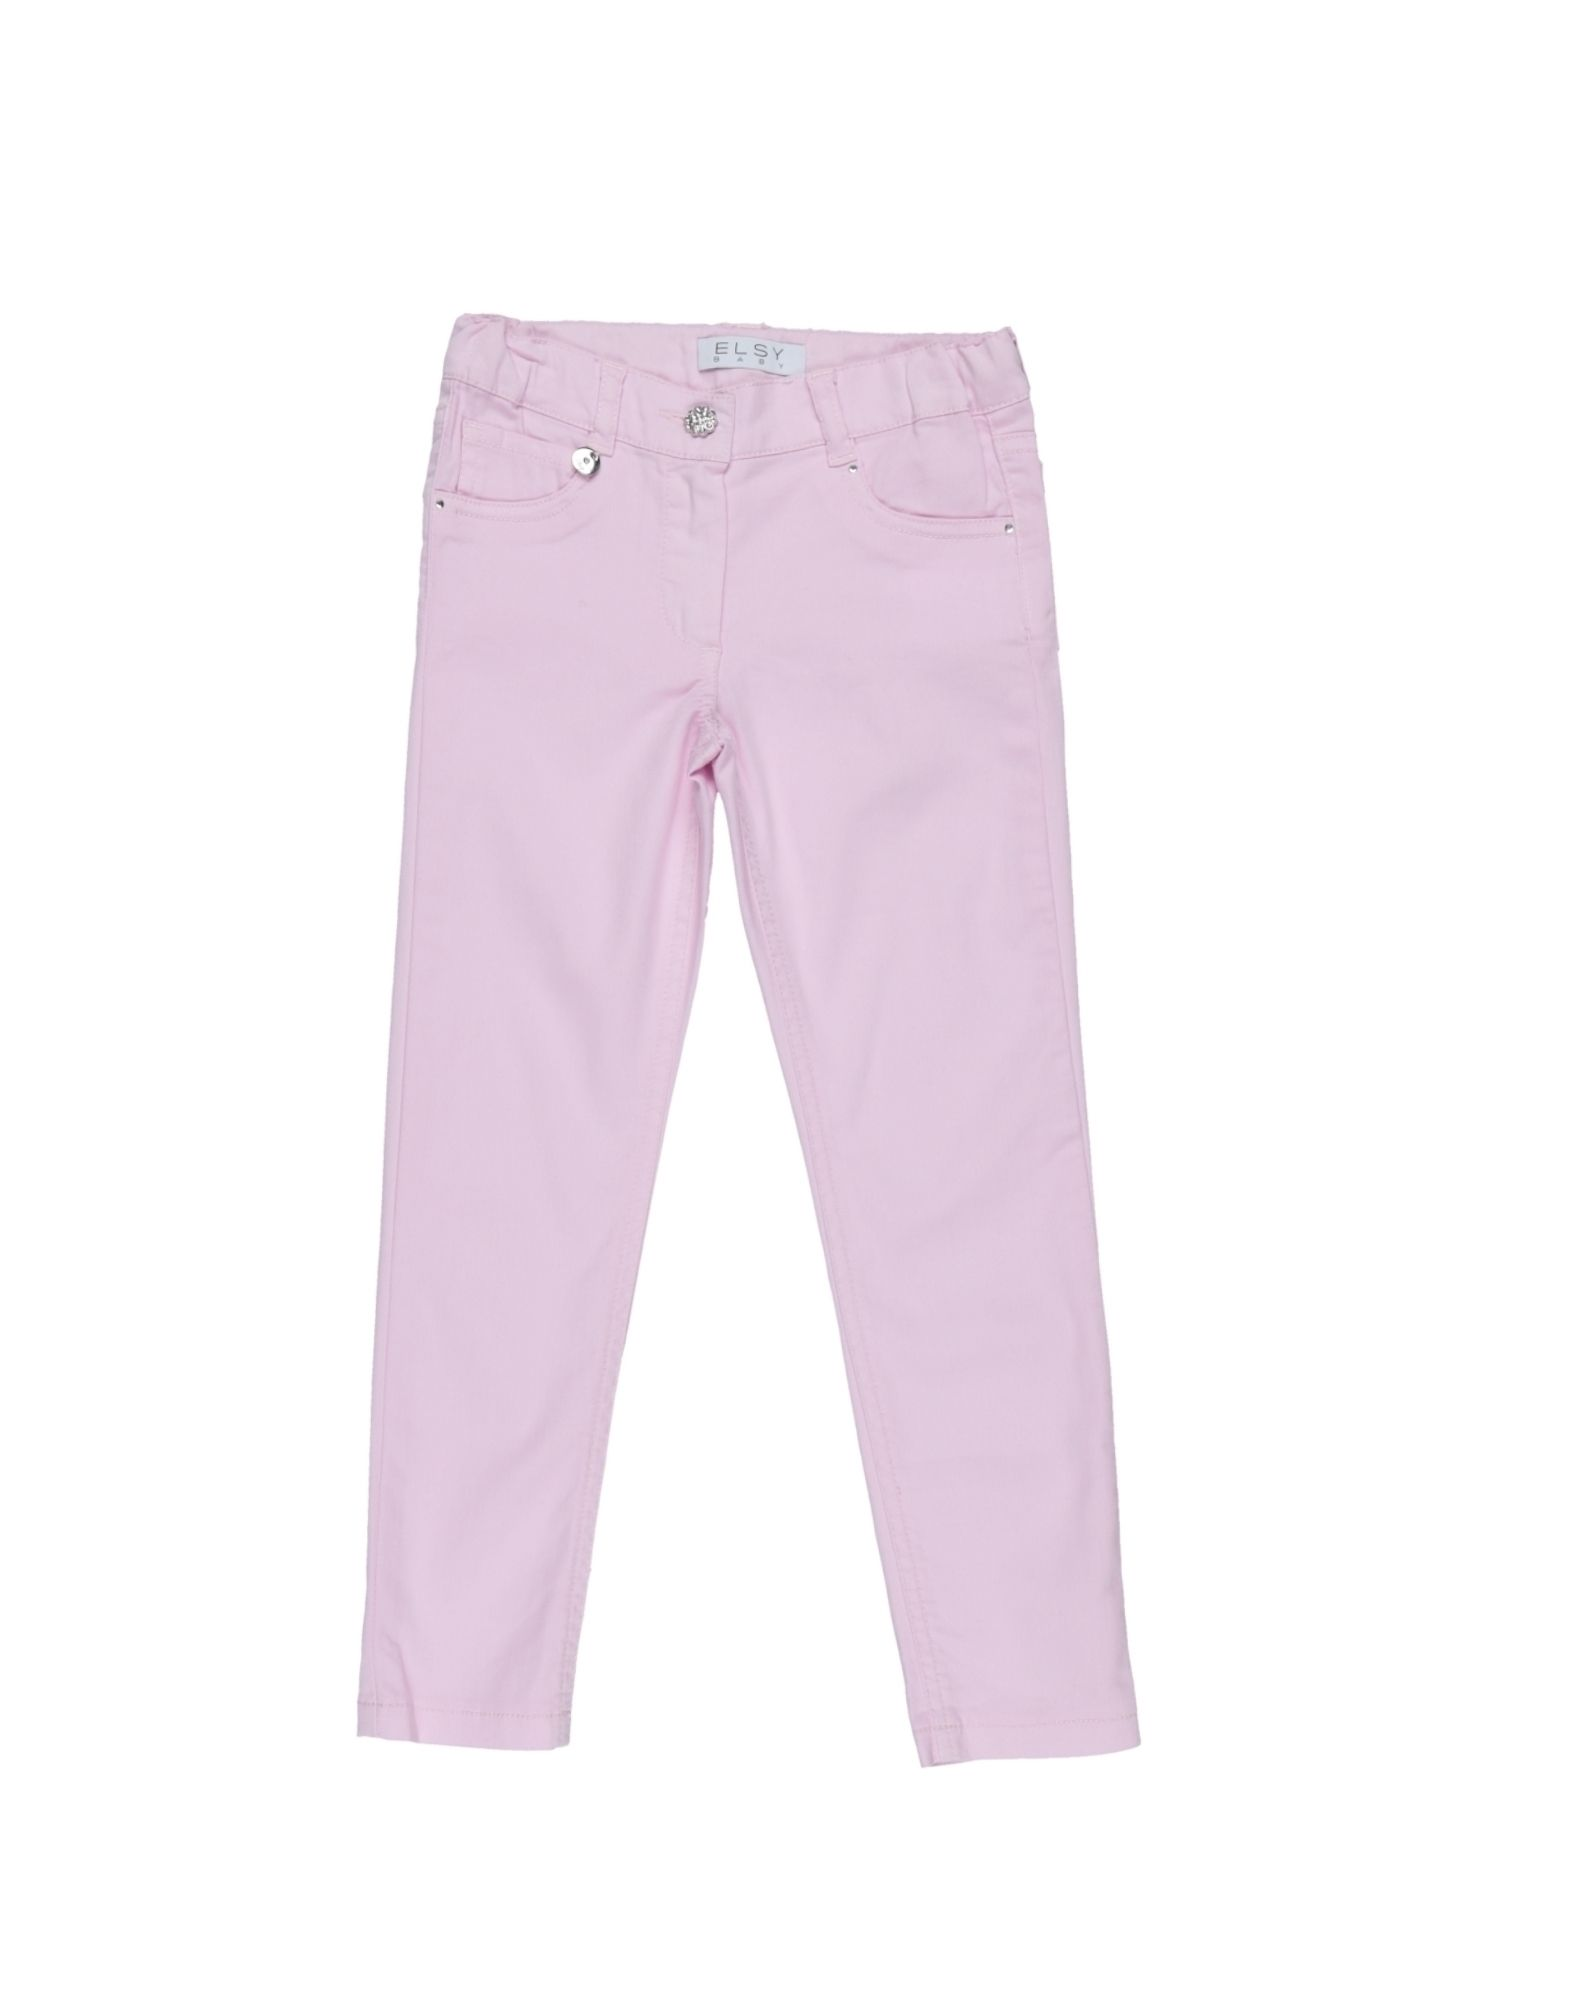 Elsy Kids' Casual Pants In Pink